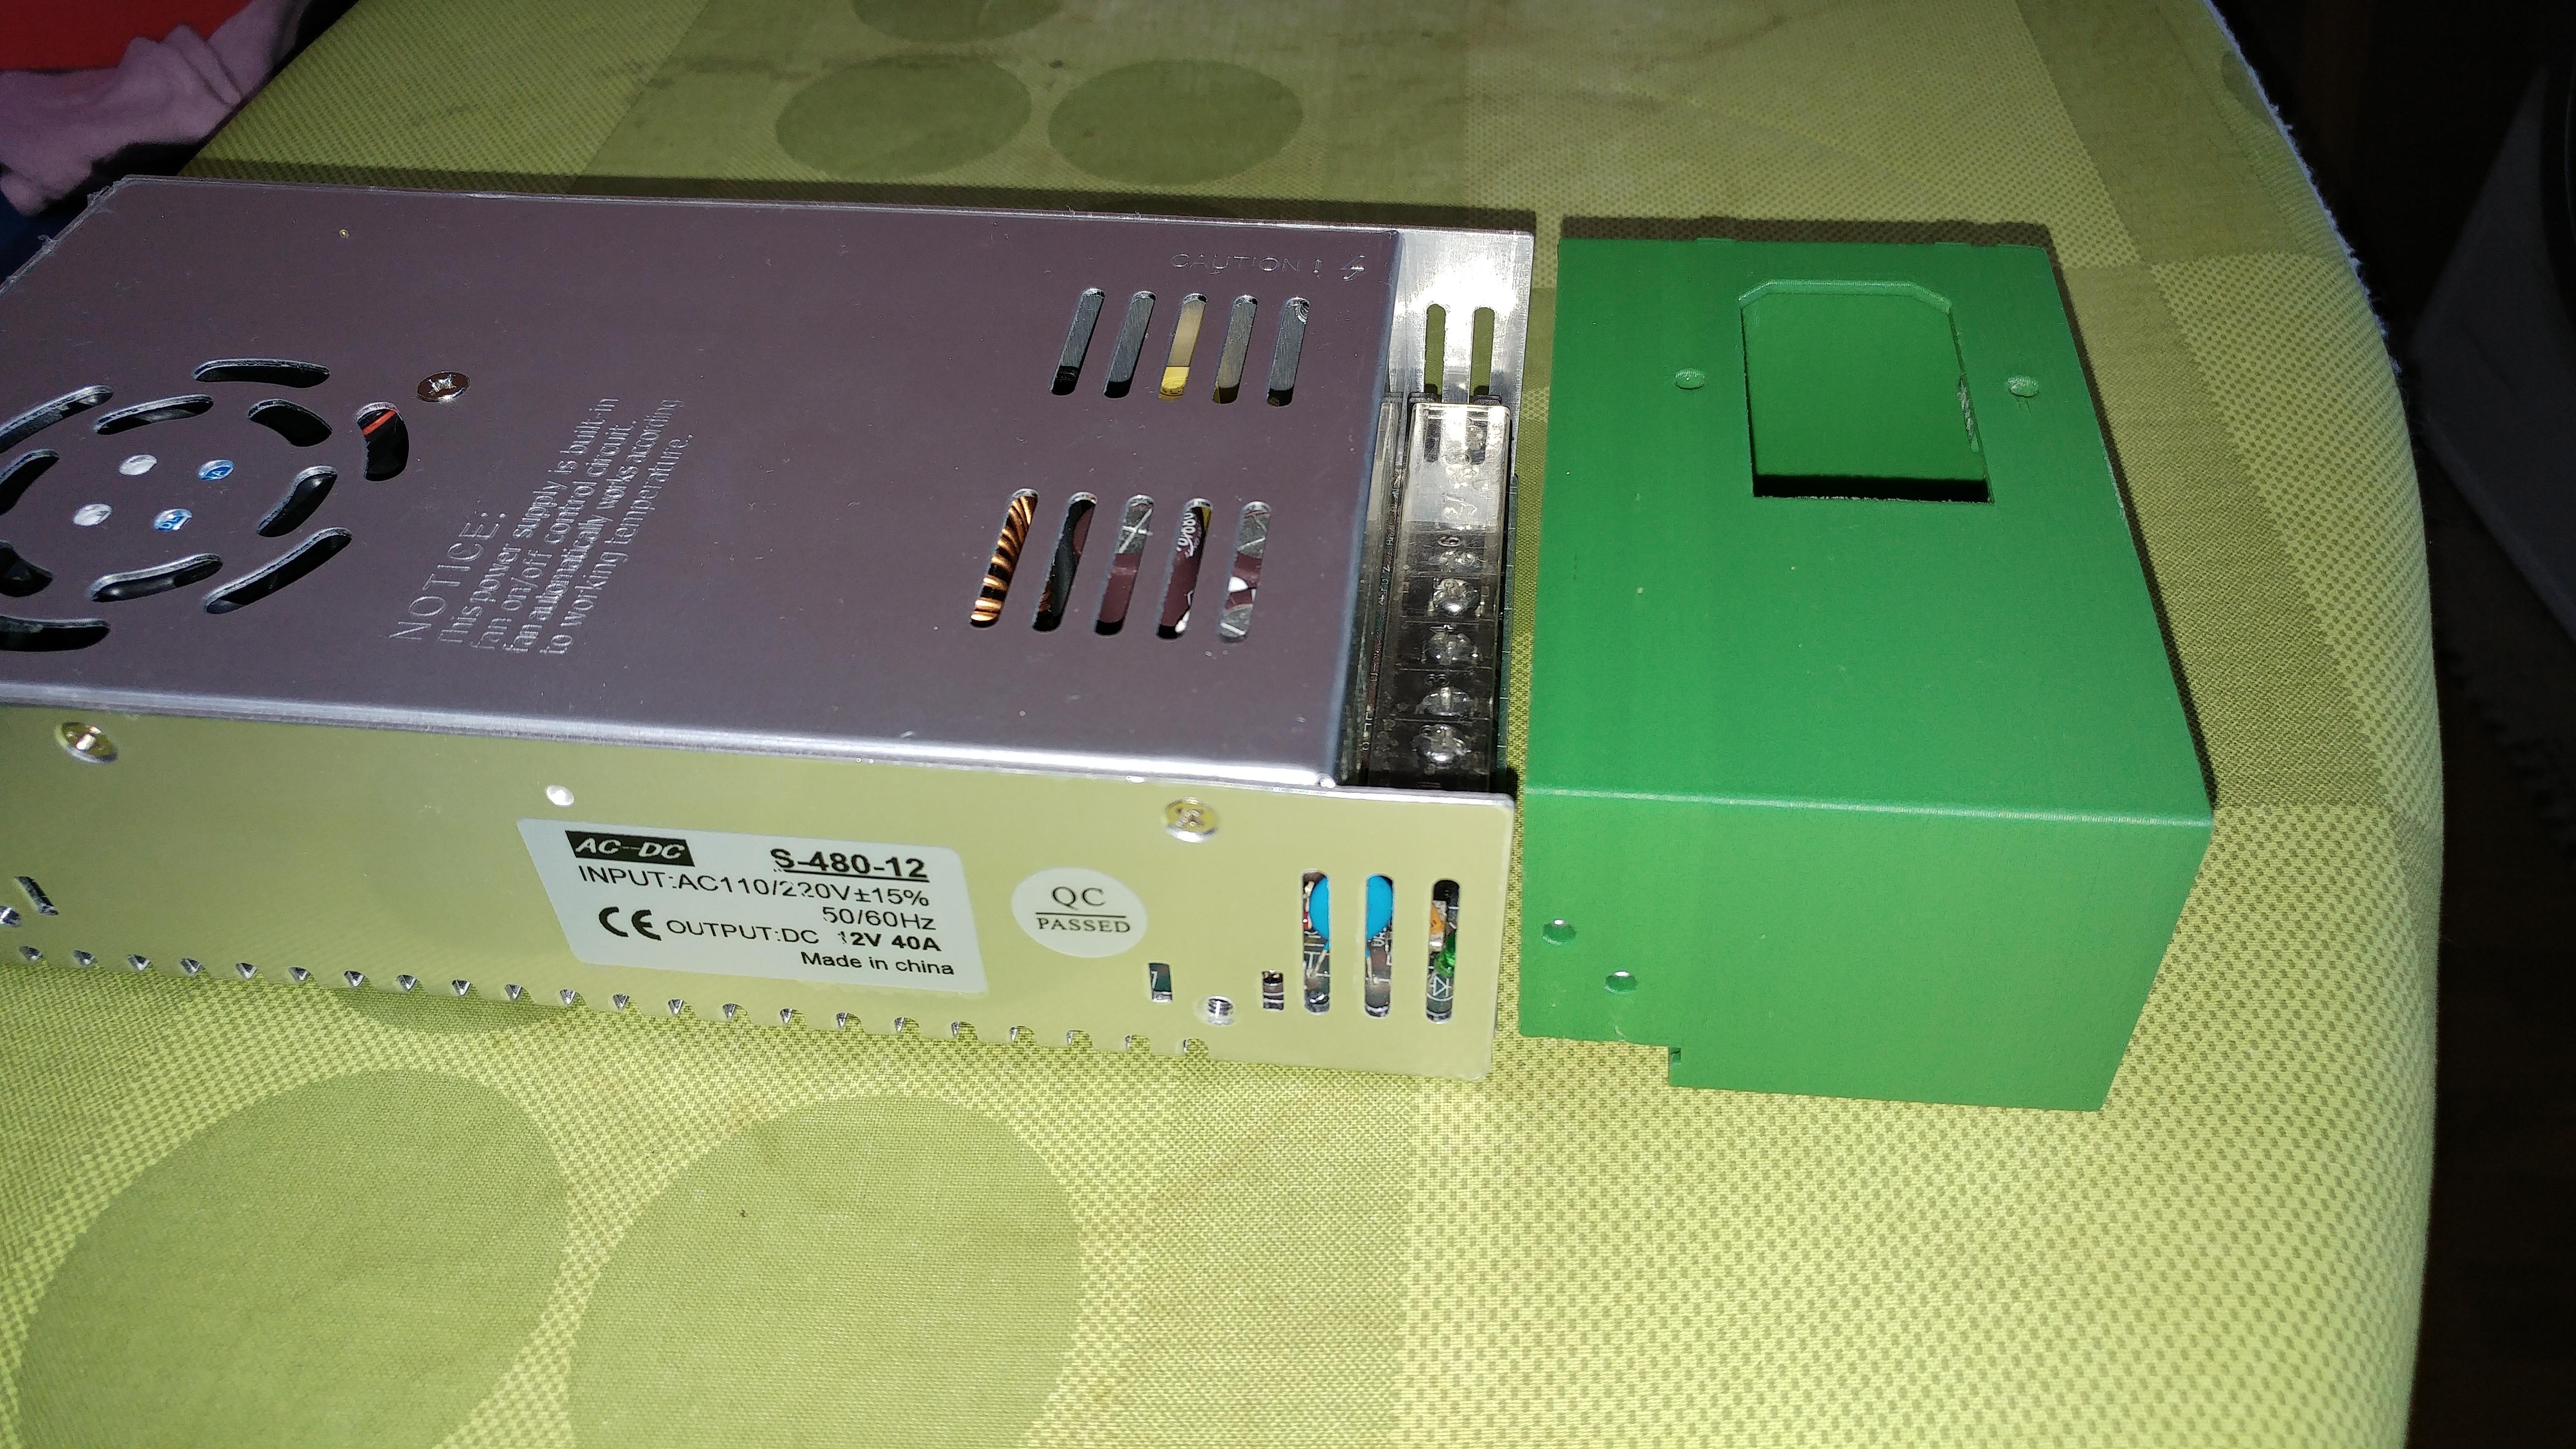 20190816_123103.jpg Télécharger fichier STL gratuit Carcasa Fuente de Alimentación con interruptor de encendido • Plan pour imprimante 3D, celtarra12